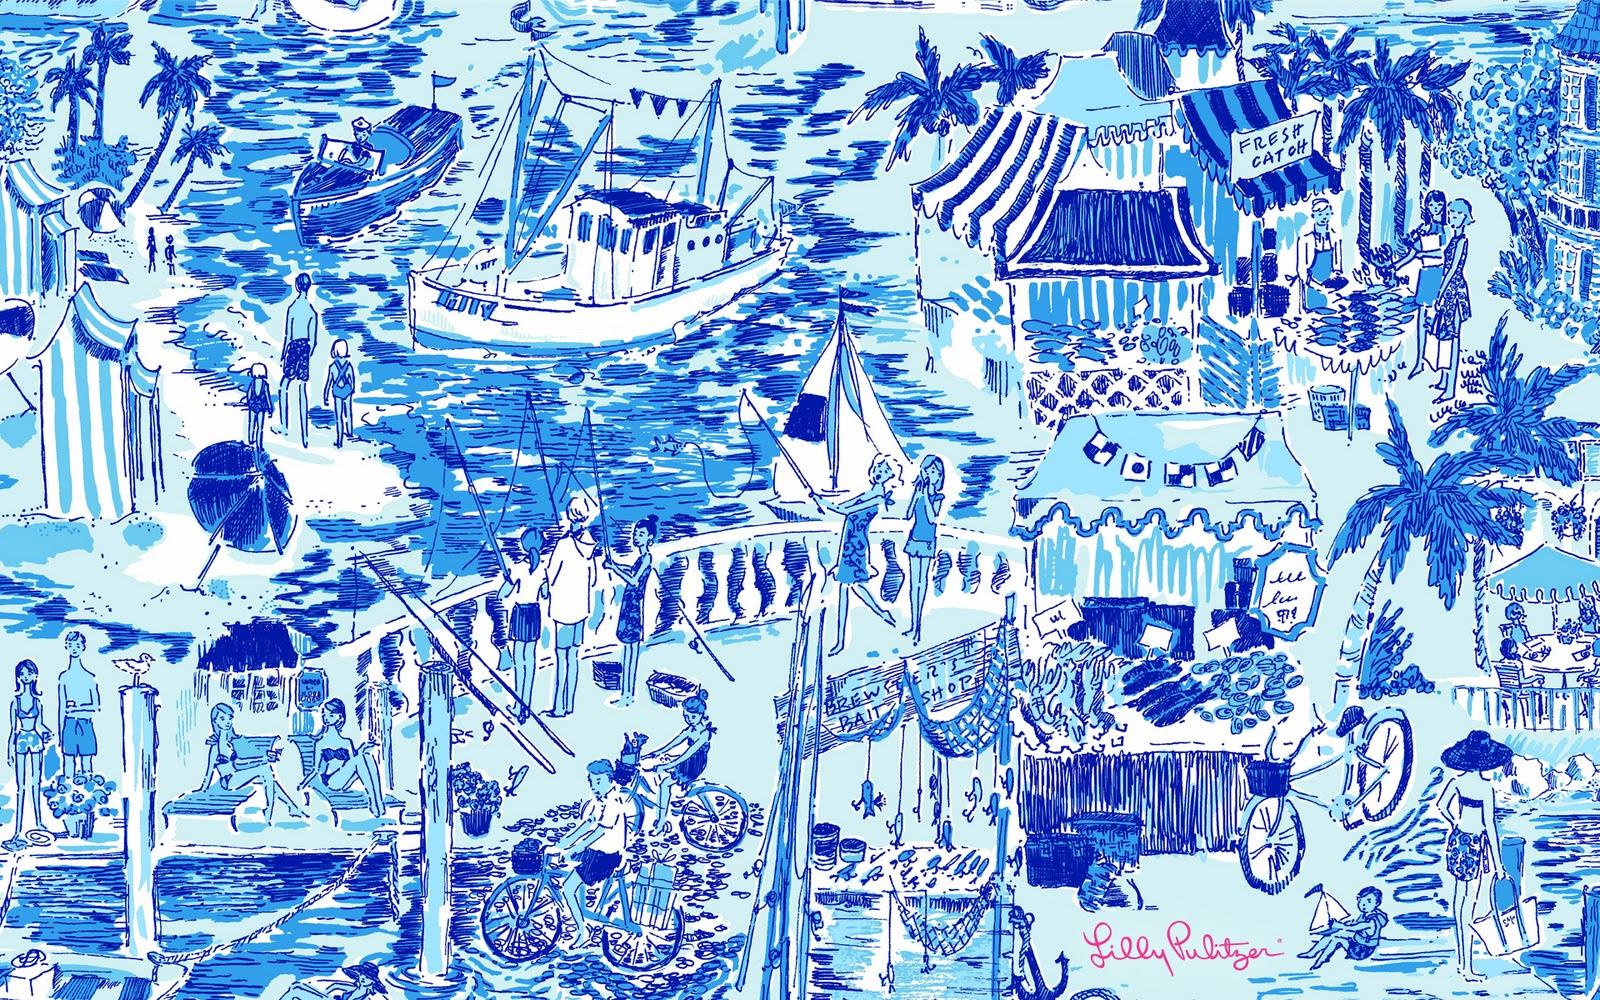 CanadianPrep-Lilly-Desktop-wallpaper-wp5002190